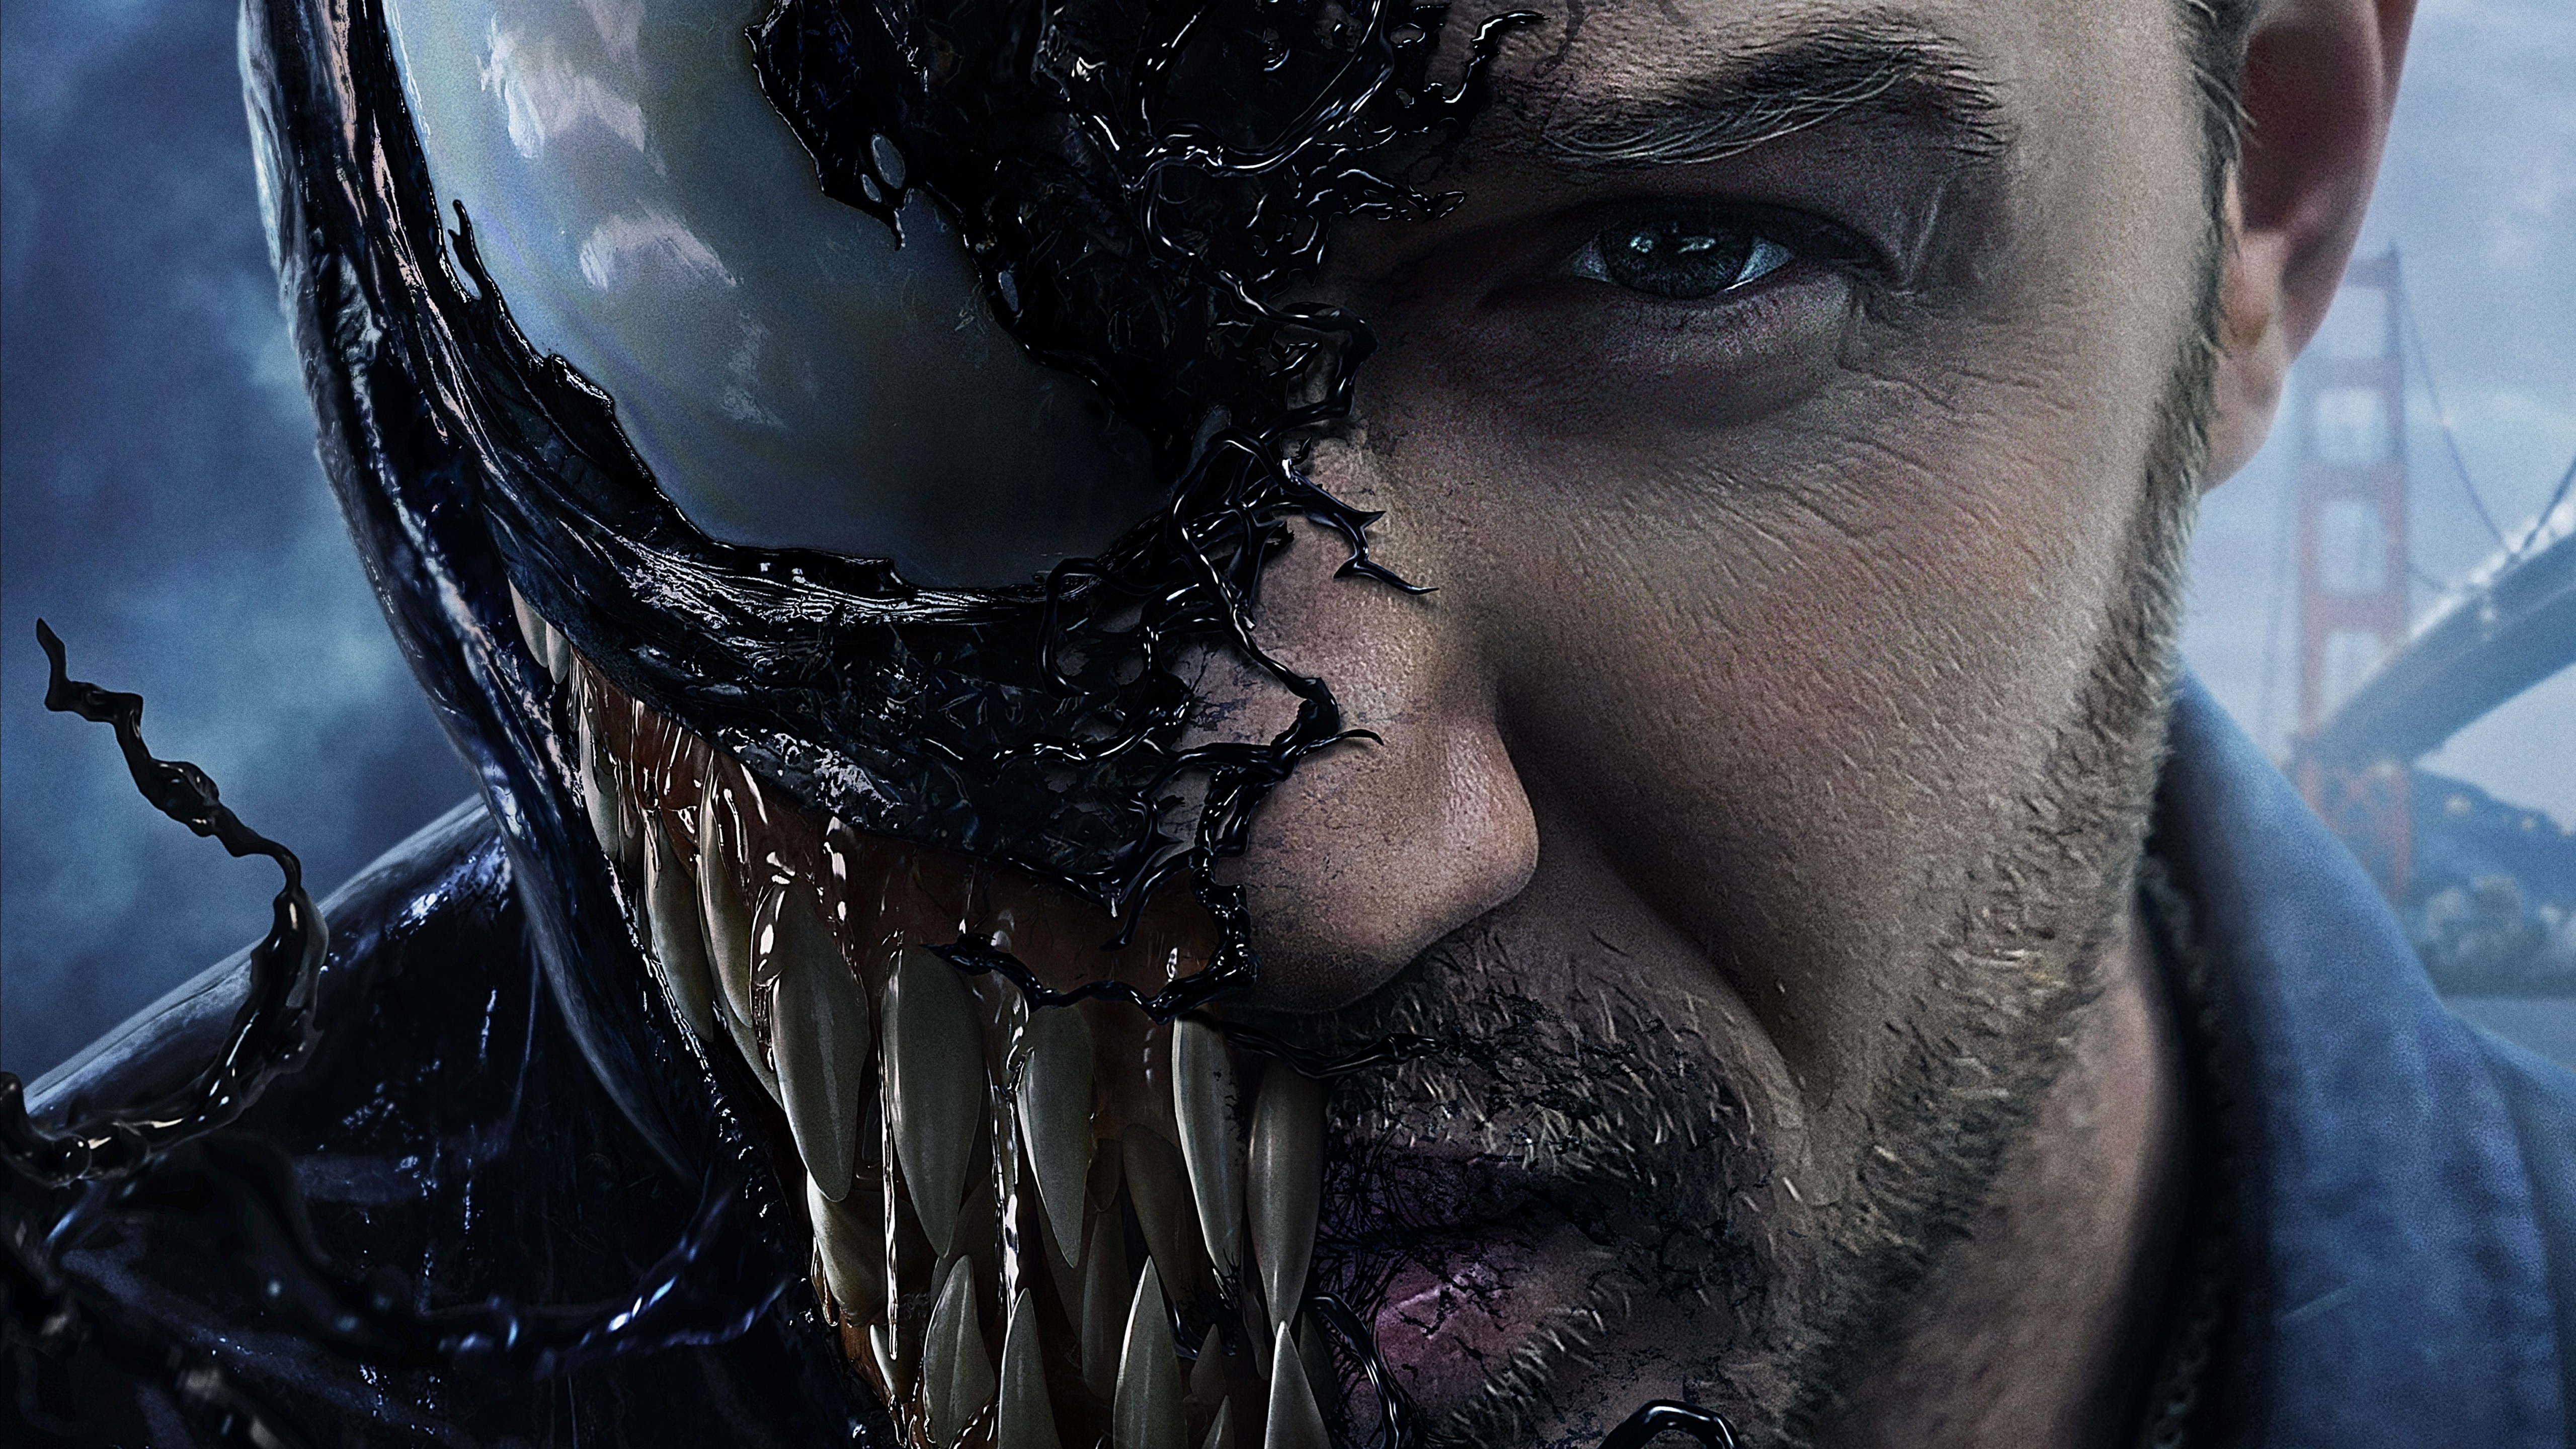 Fondos de pantalla Venom Película Tom Hardy